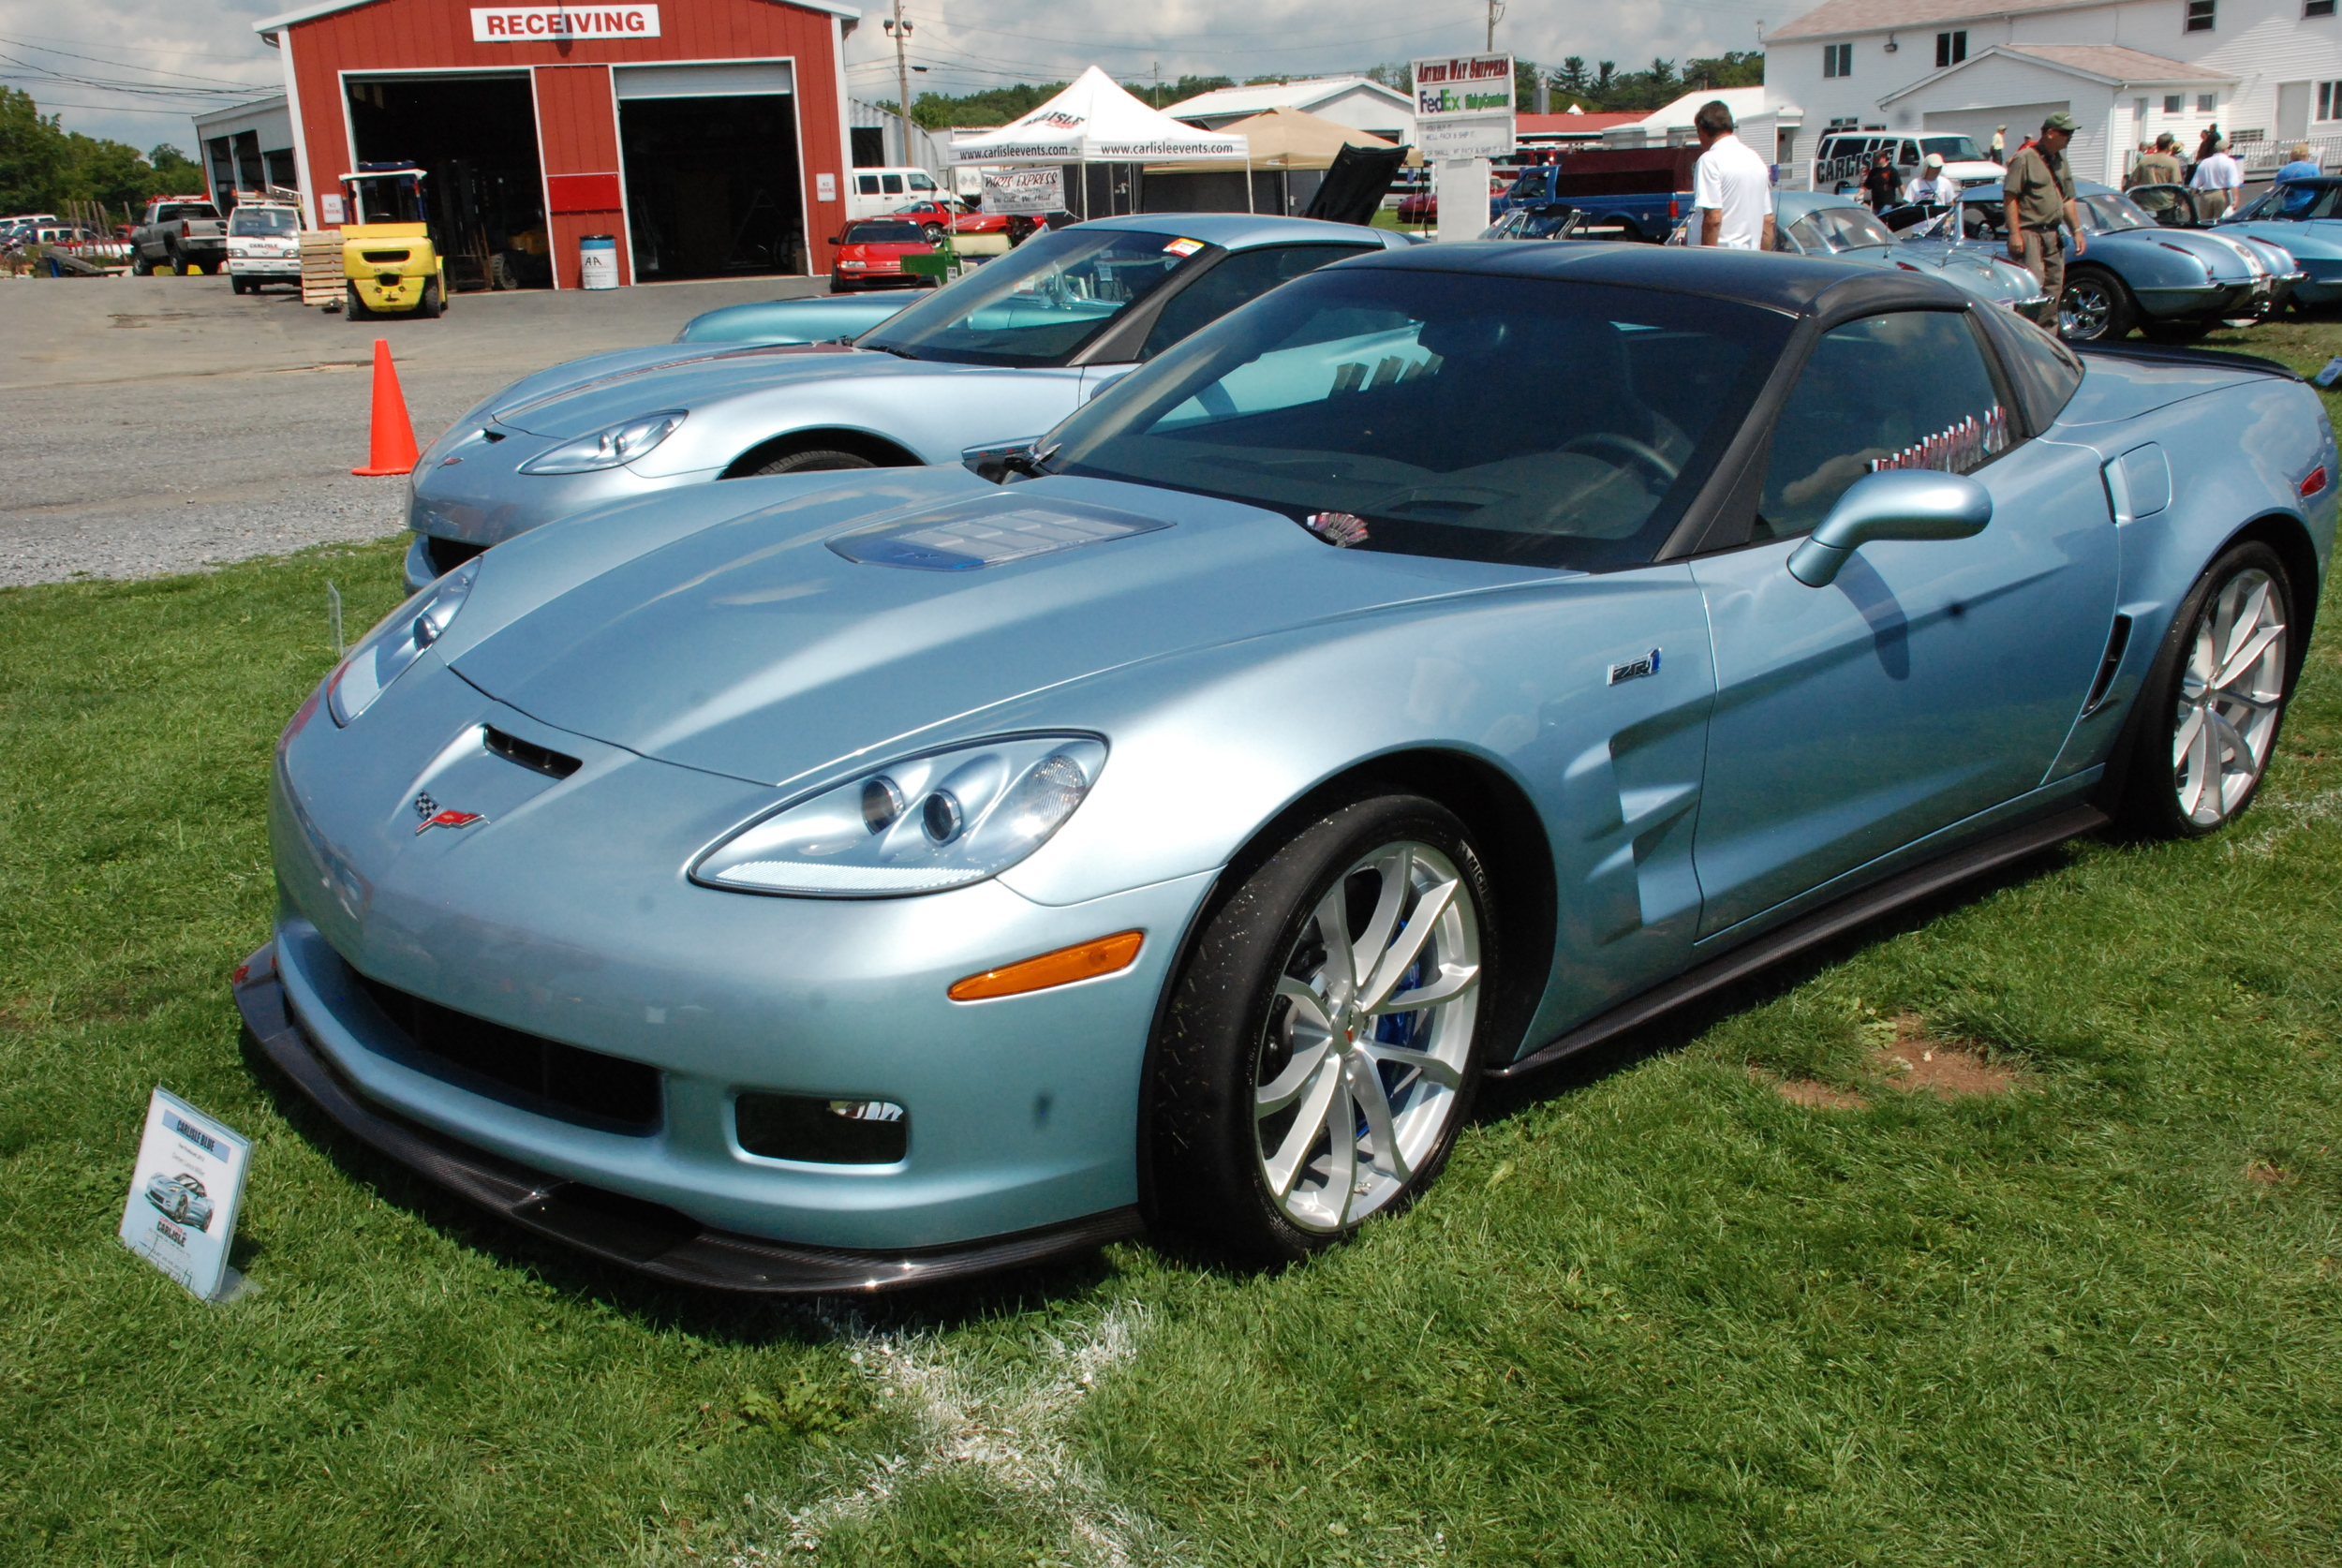 The Carlisle Events Corvette show is so popular that Corvette honored Carlisle Events with its own color—Carlisle Blue.